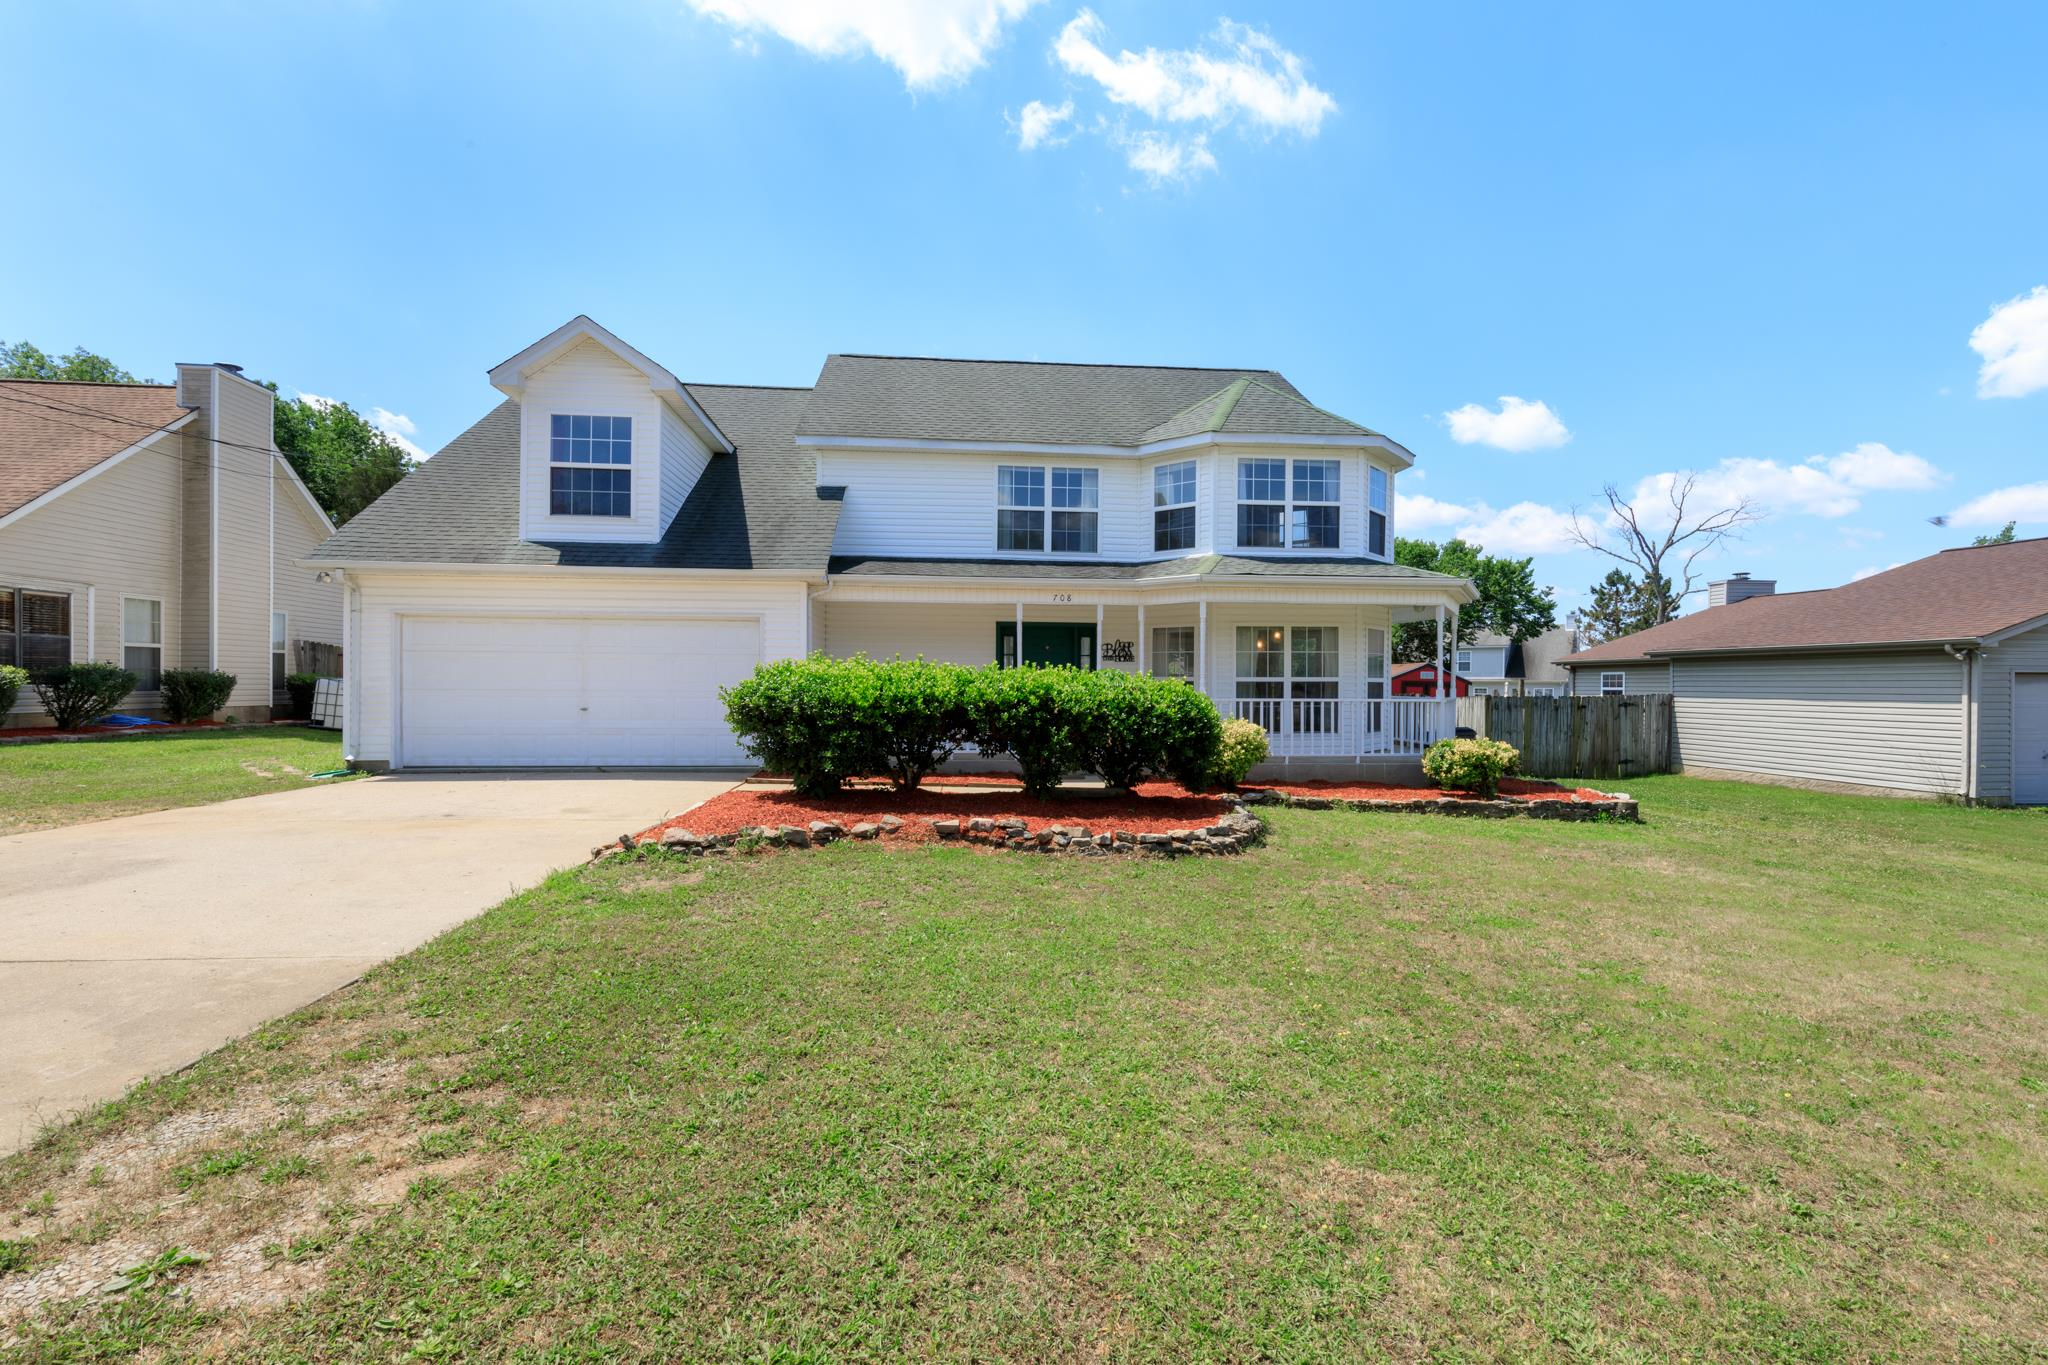 708 Alisa Cv, LA VERGNE, TN 37086 - LA VERGNE, TN real estate listing